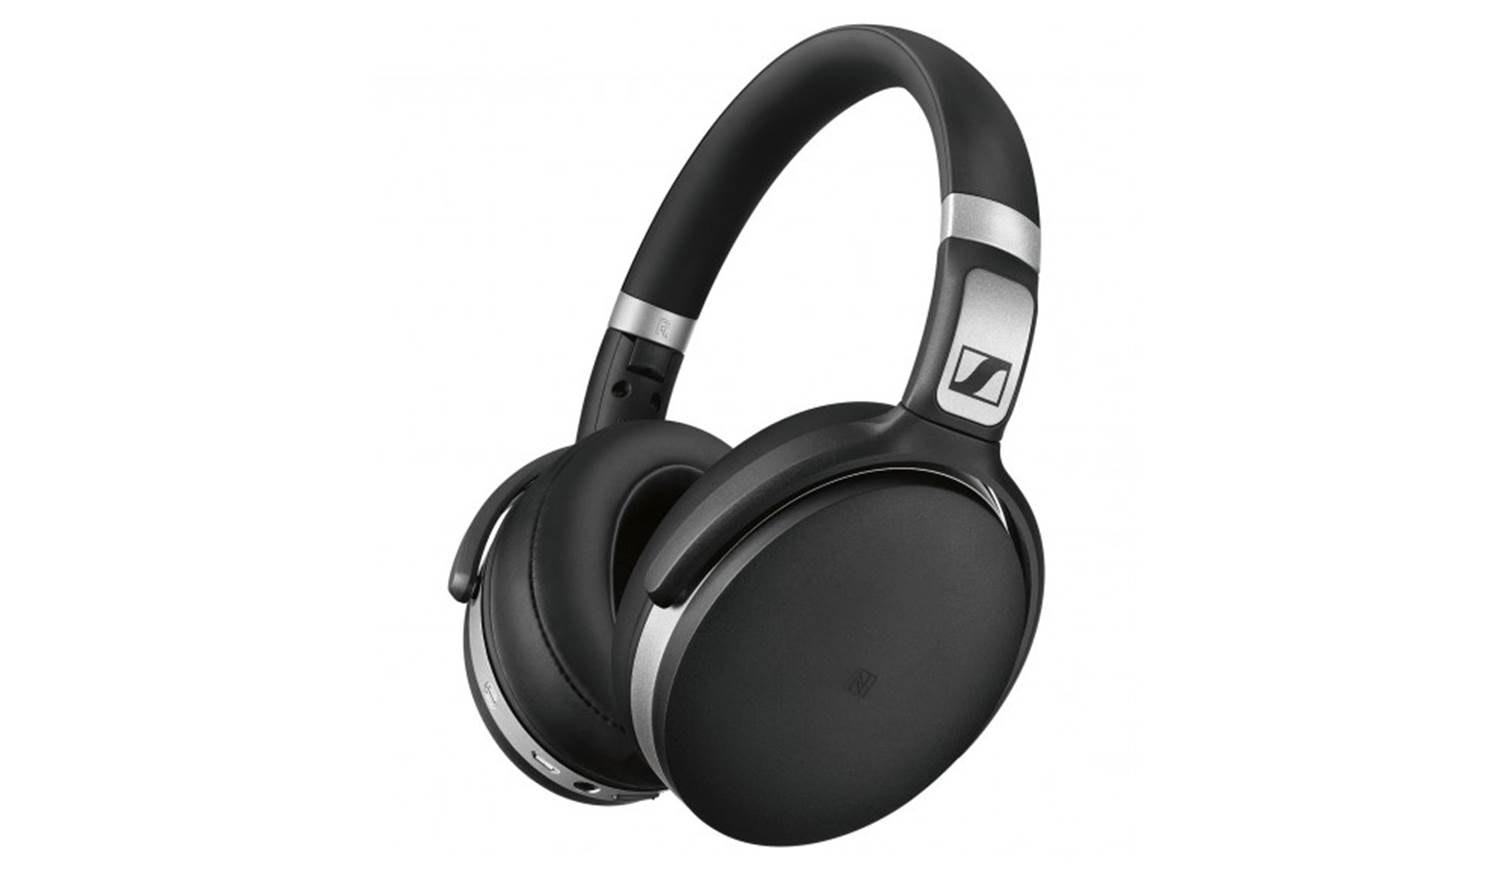 jbl headphones wireless gold. sennheiser hd 4.50 btnc wireless over-ear headphone jbl headphones gold